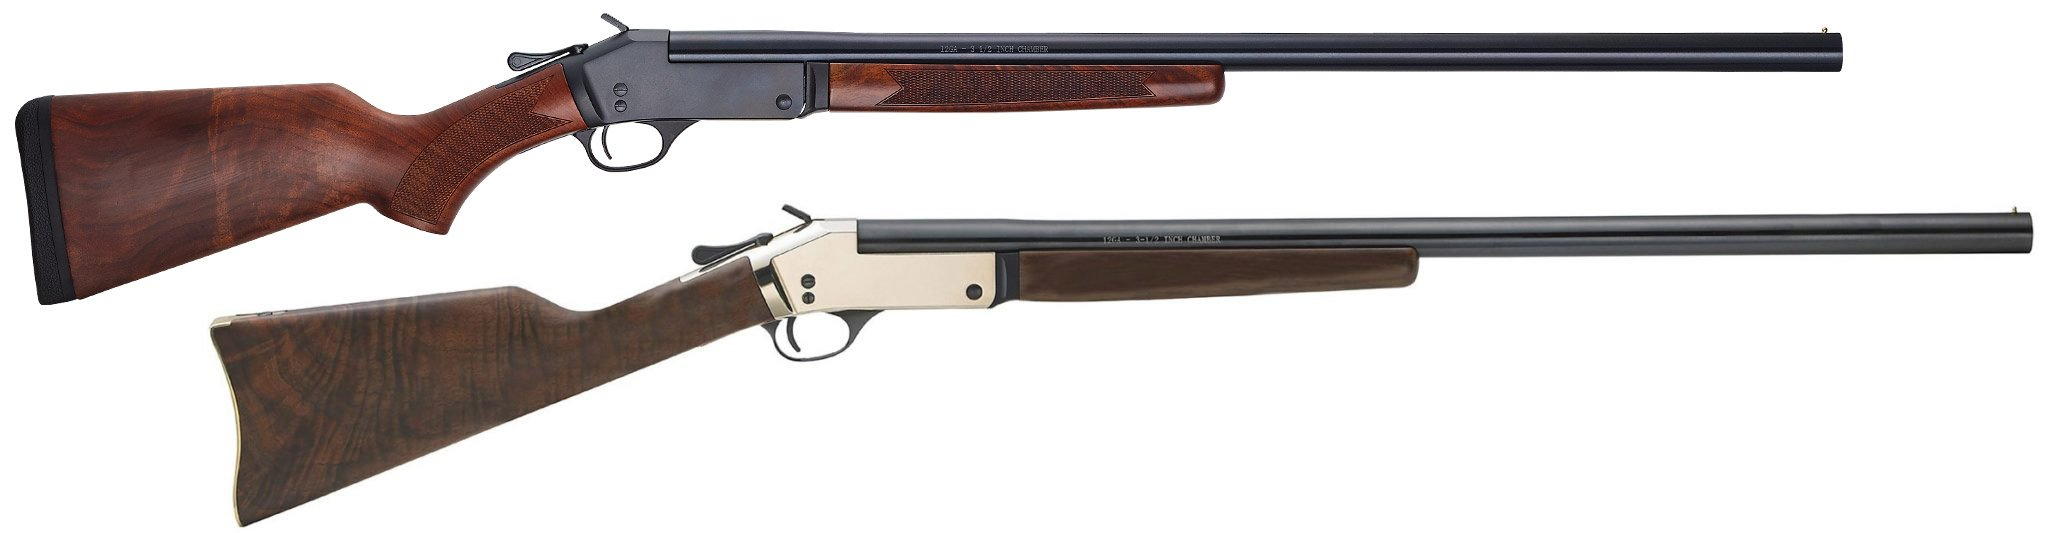 The best single-shot shotguns ever